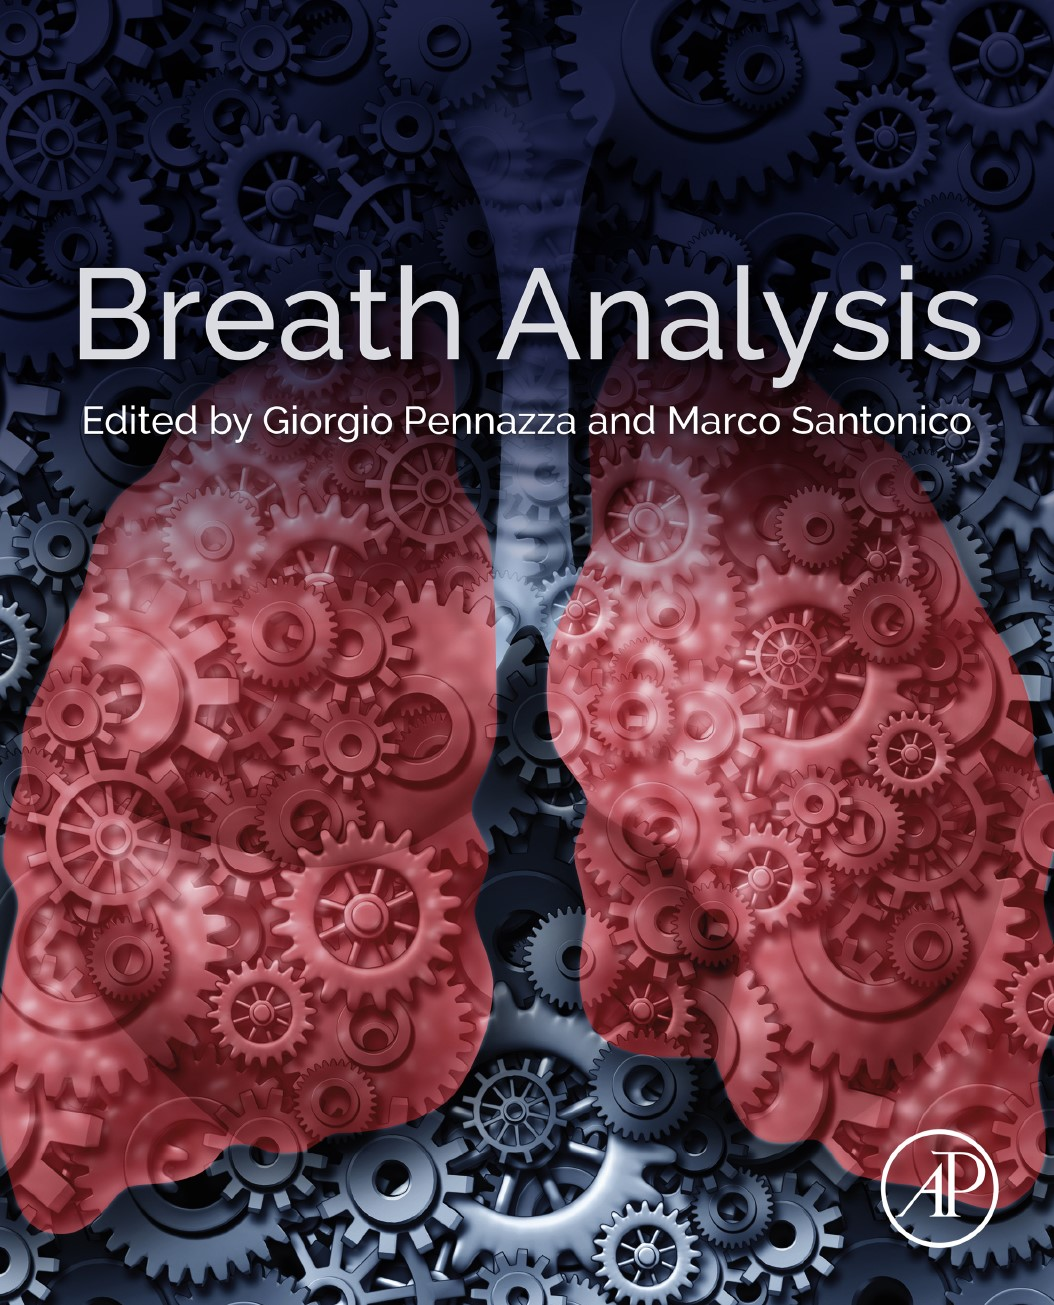 Breath Analysis, 2019